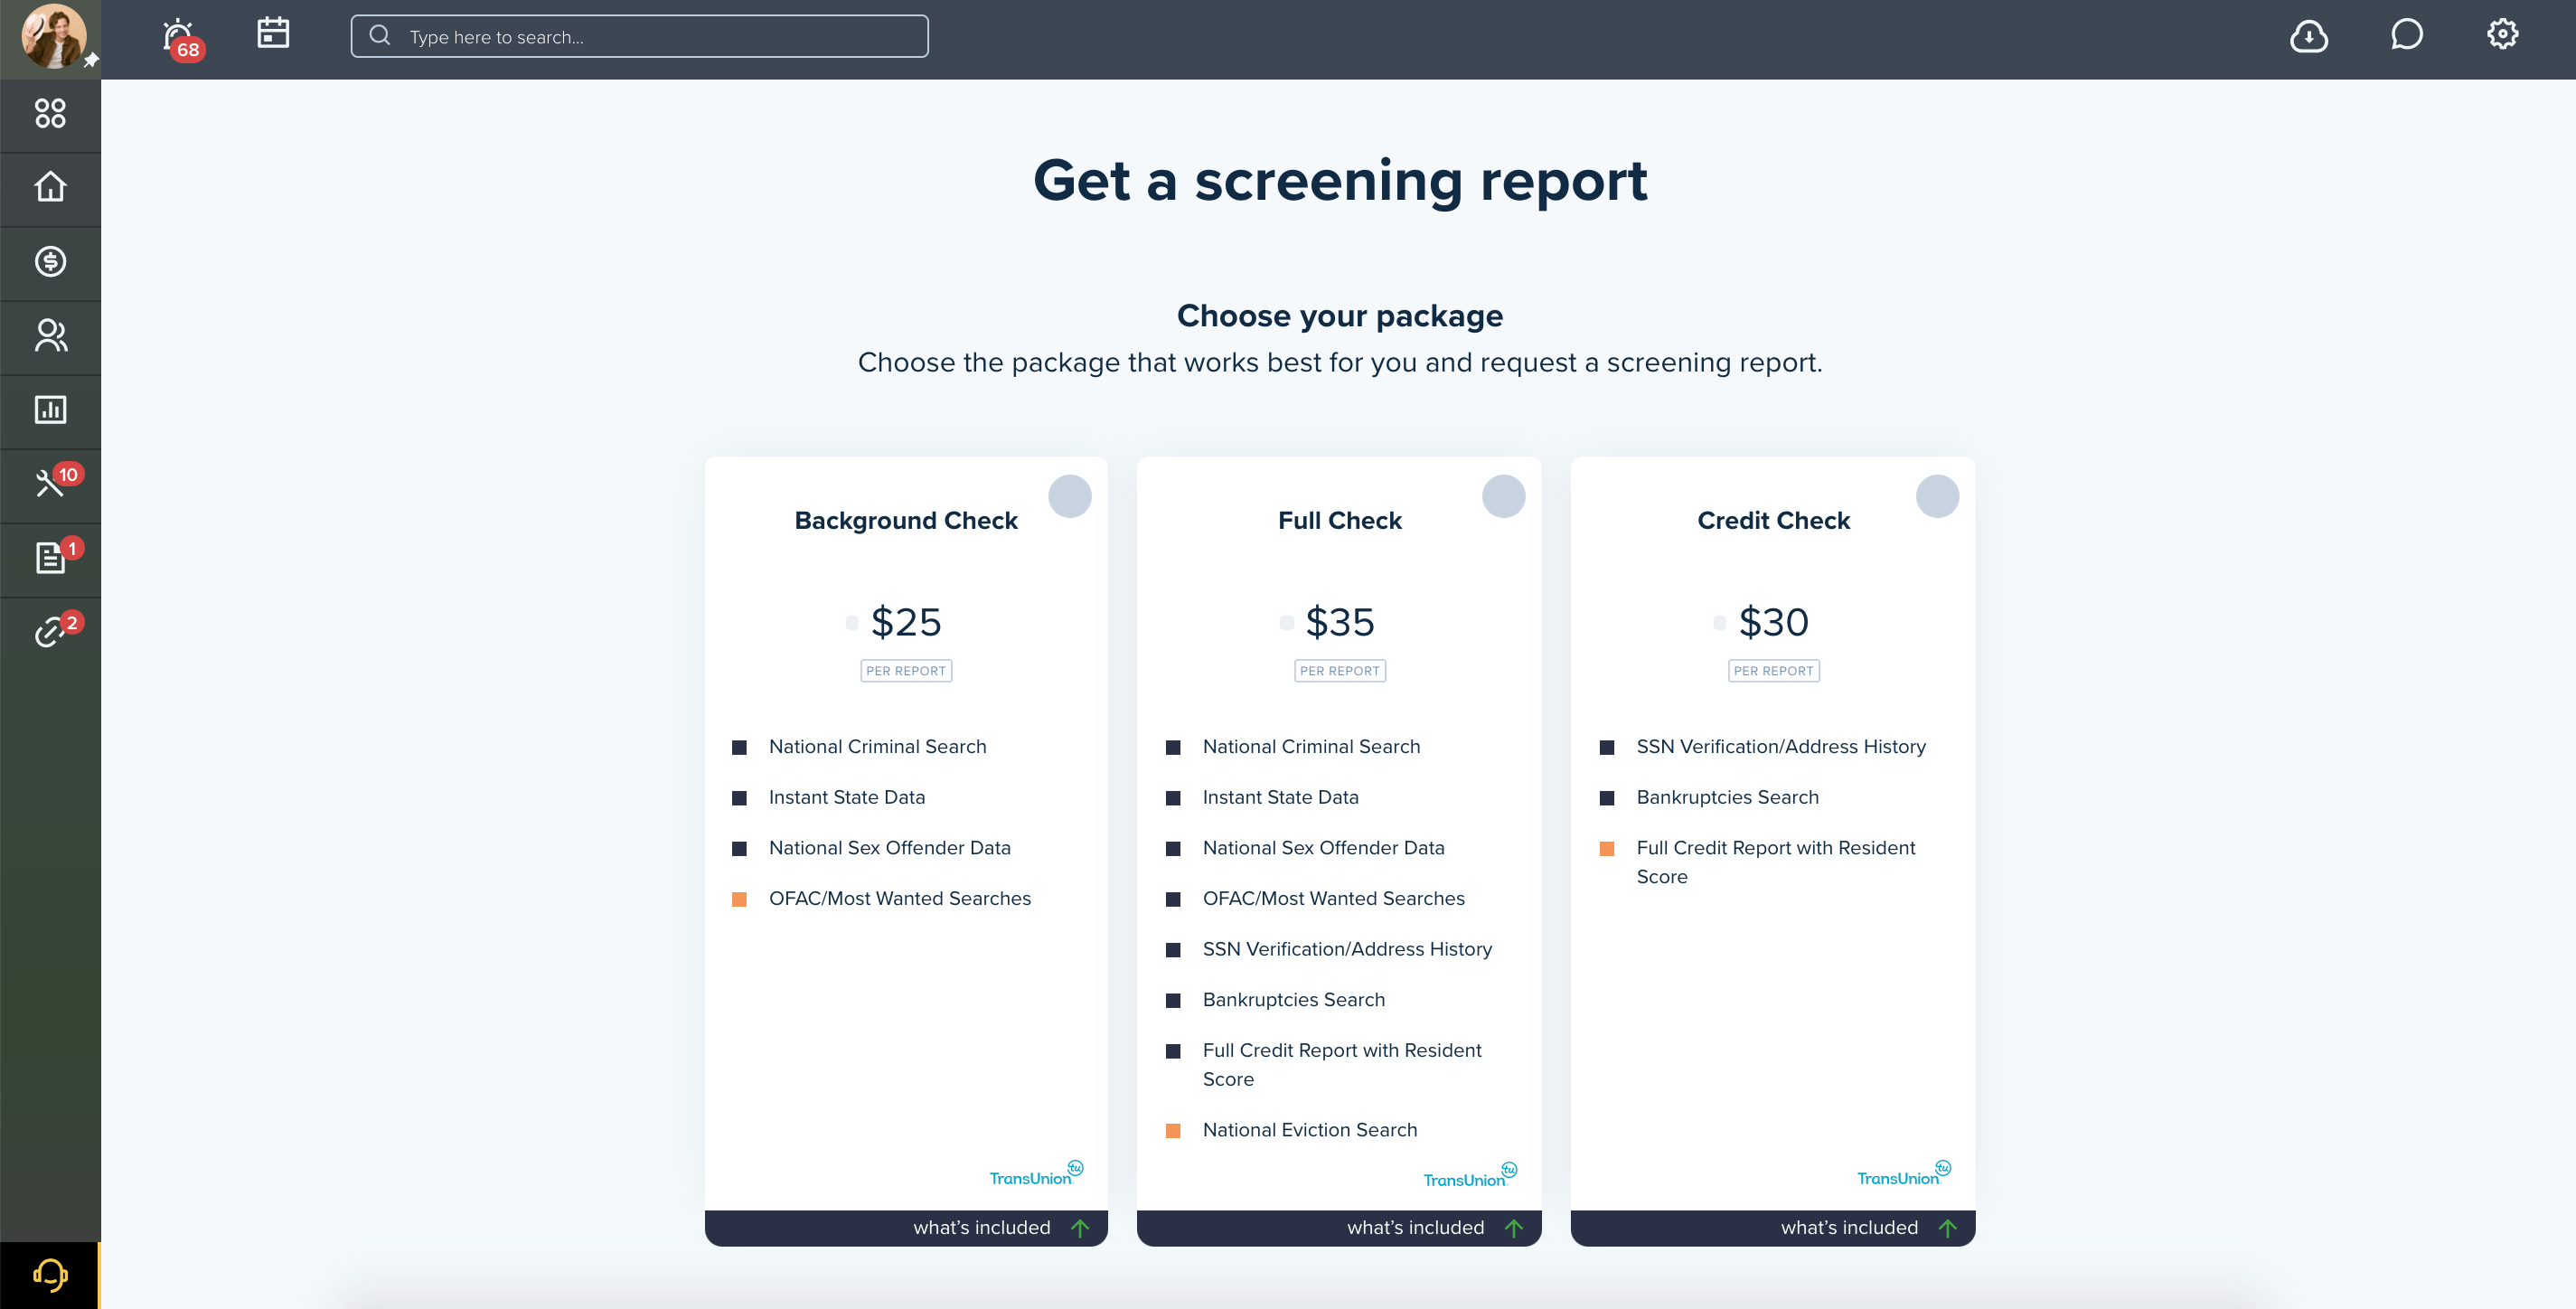 Get a screening report